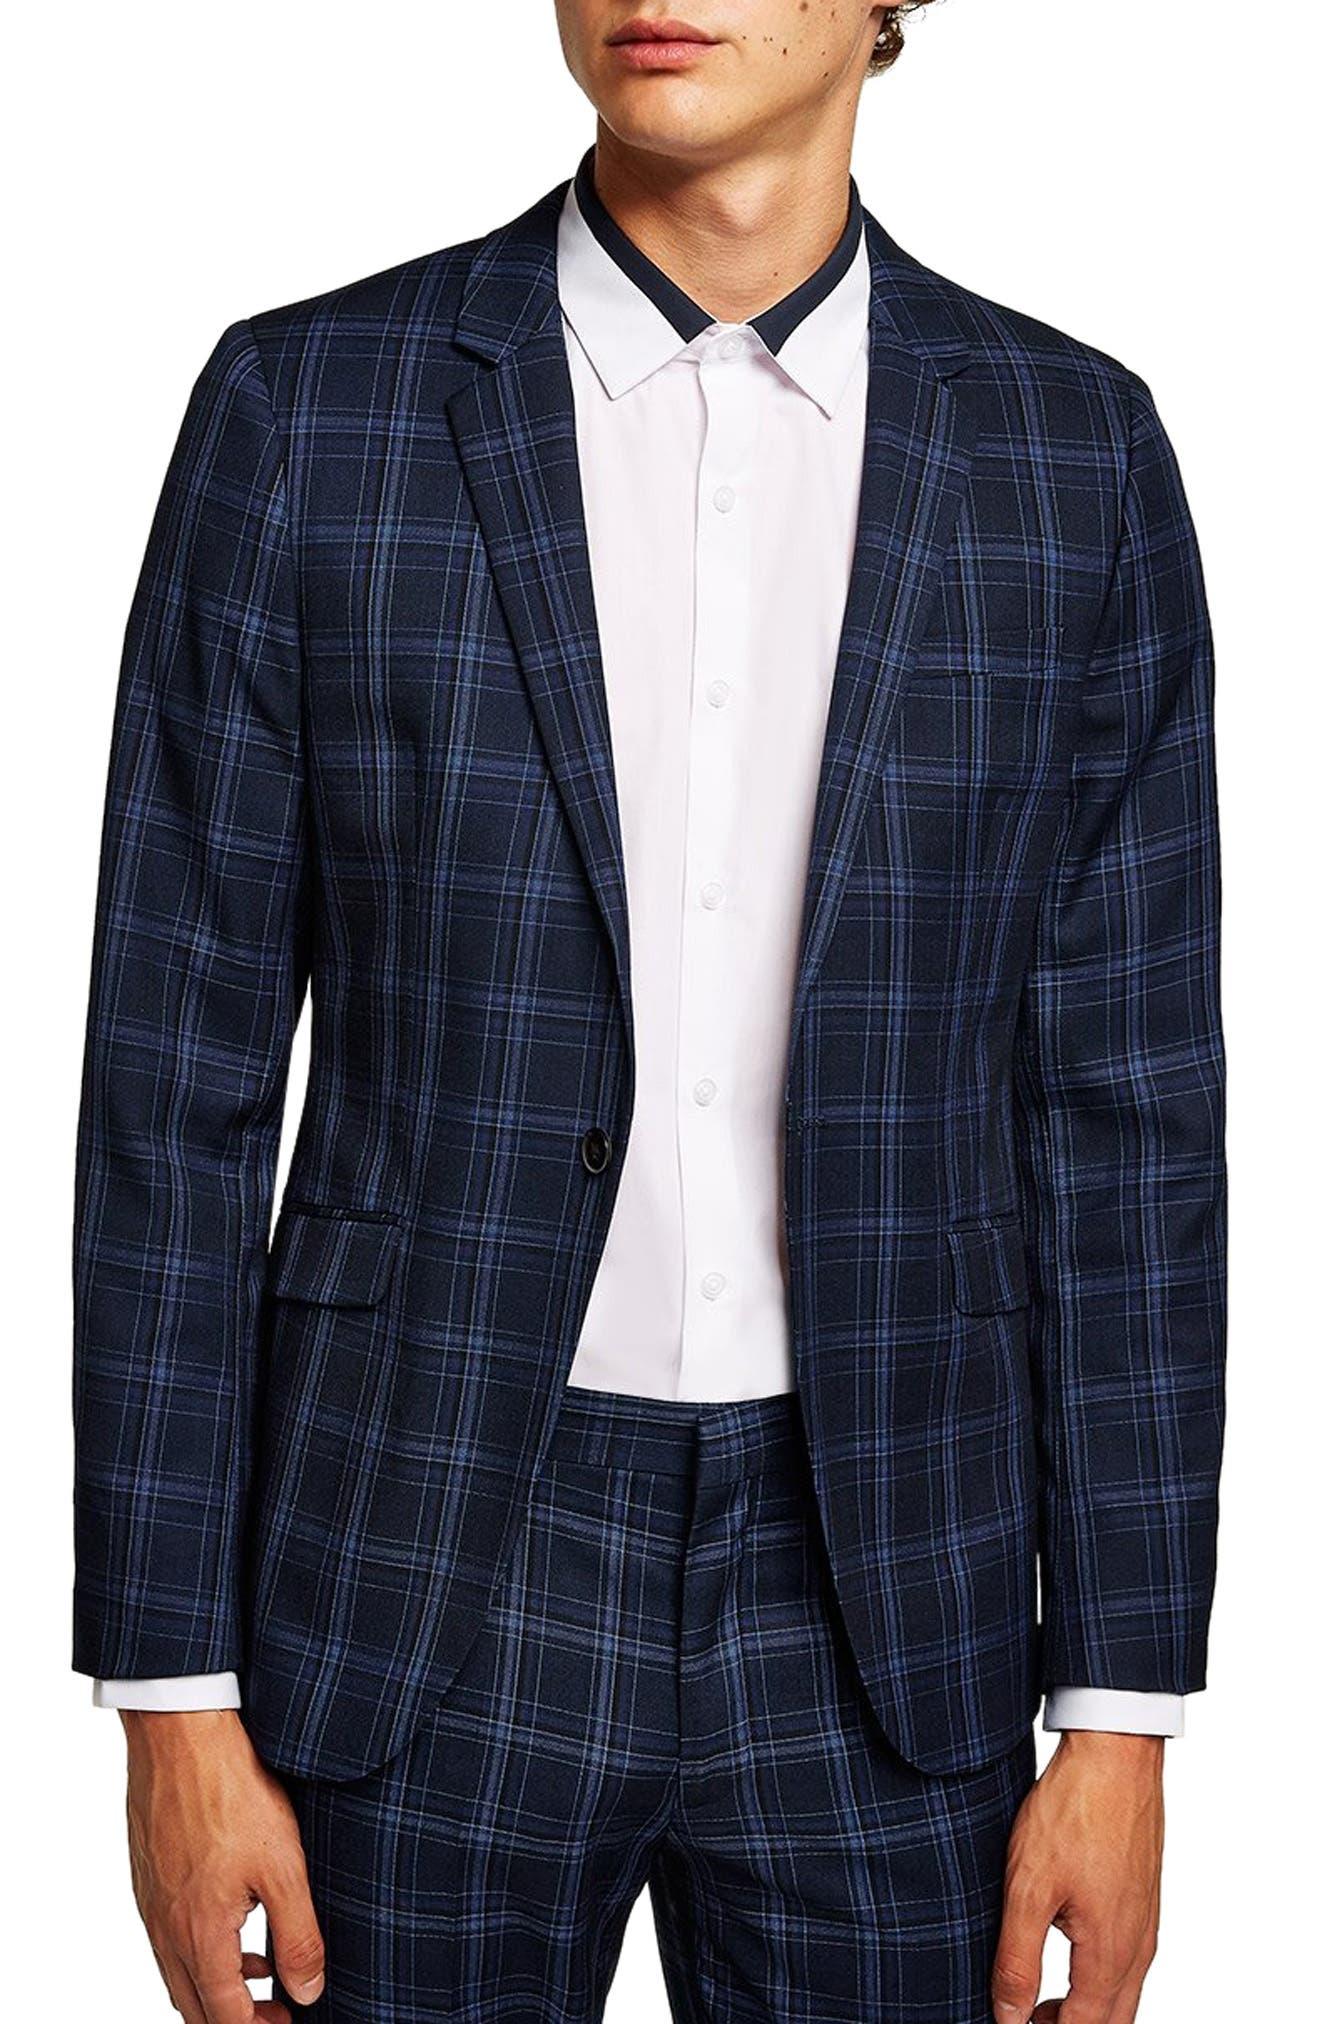 TOPMAN, Skinny Fit Check Suit Jacket, Main thumbnail 1, color, 400